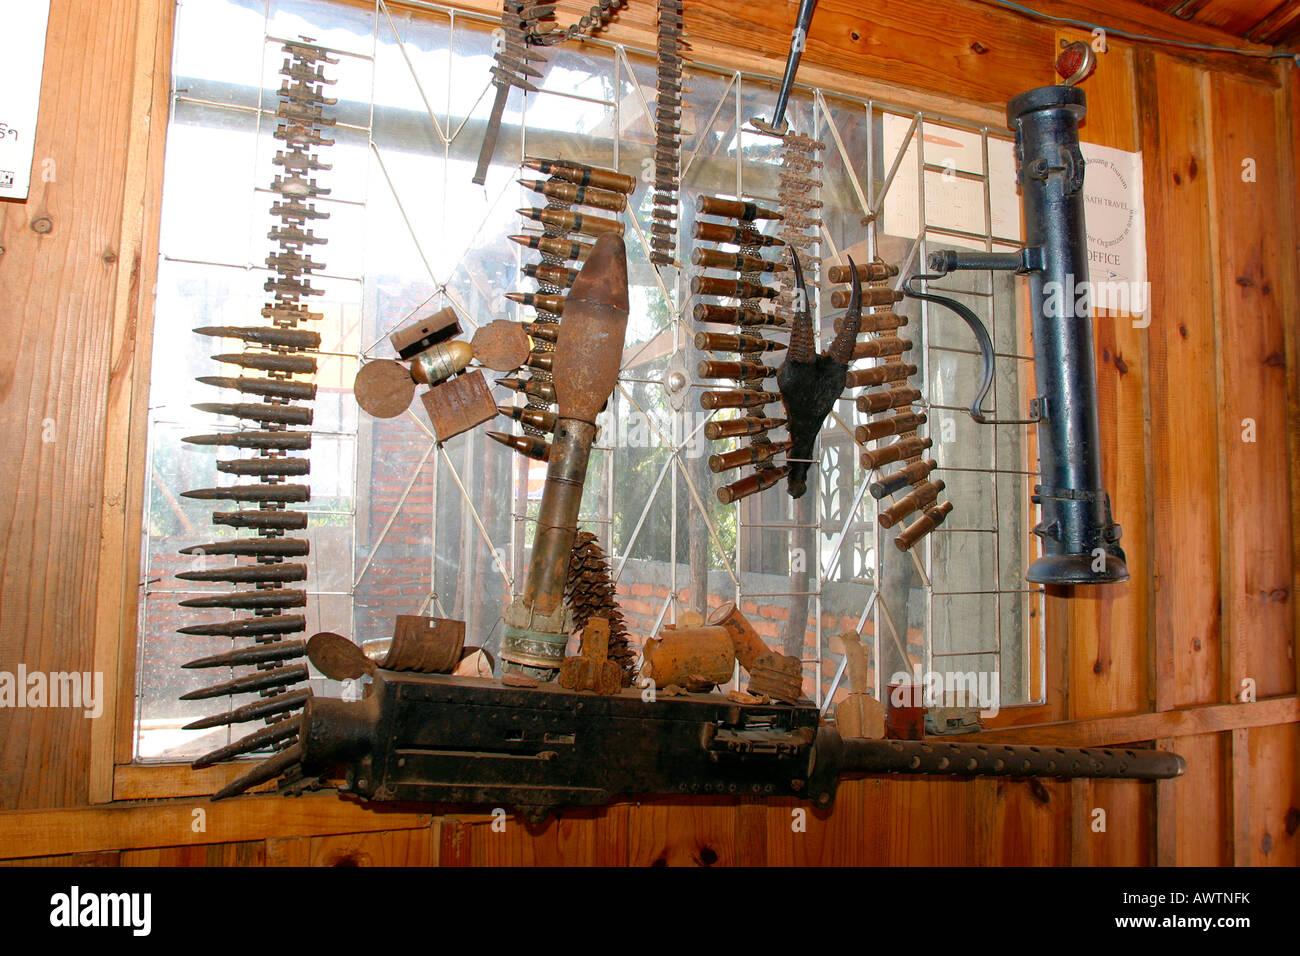 Laos Phonsavan Vietnam War armaments decorating guest house - Stock Image